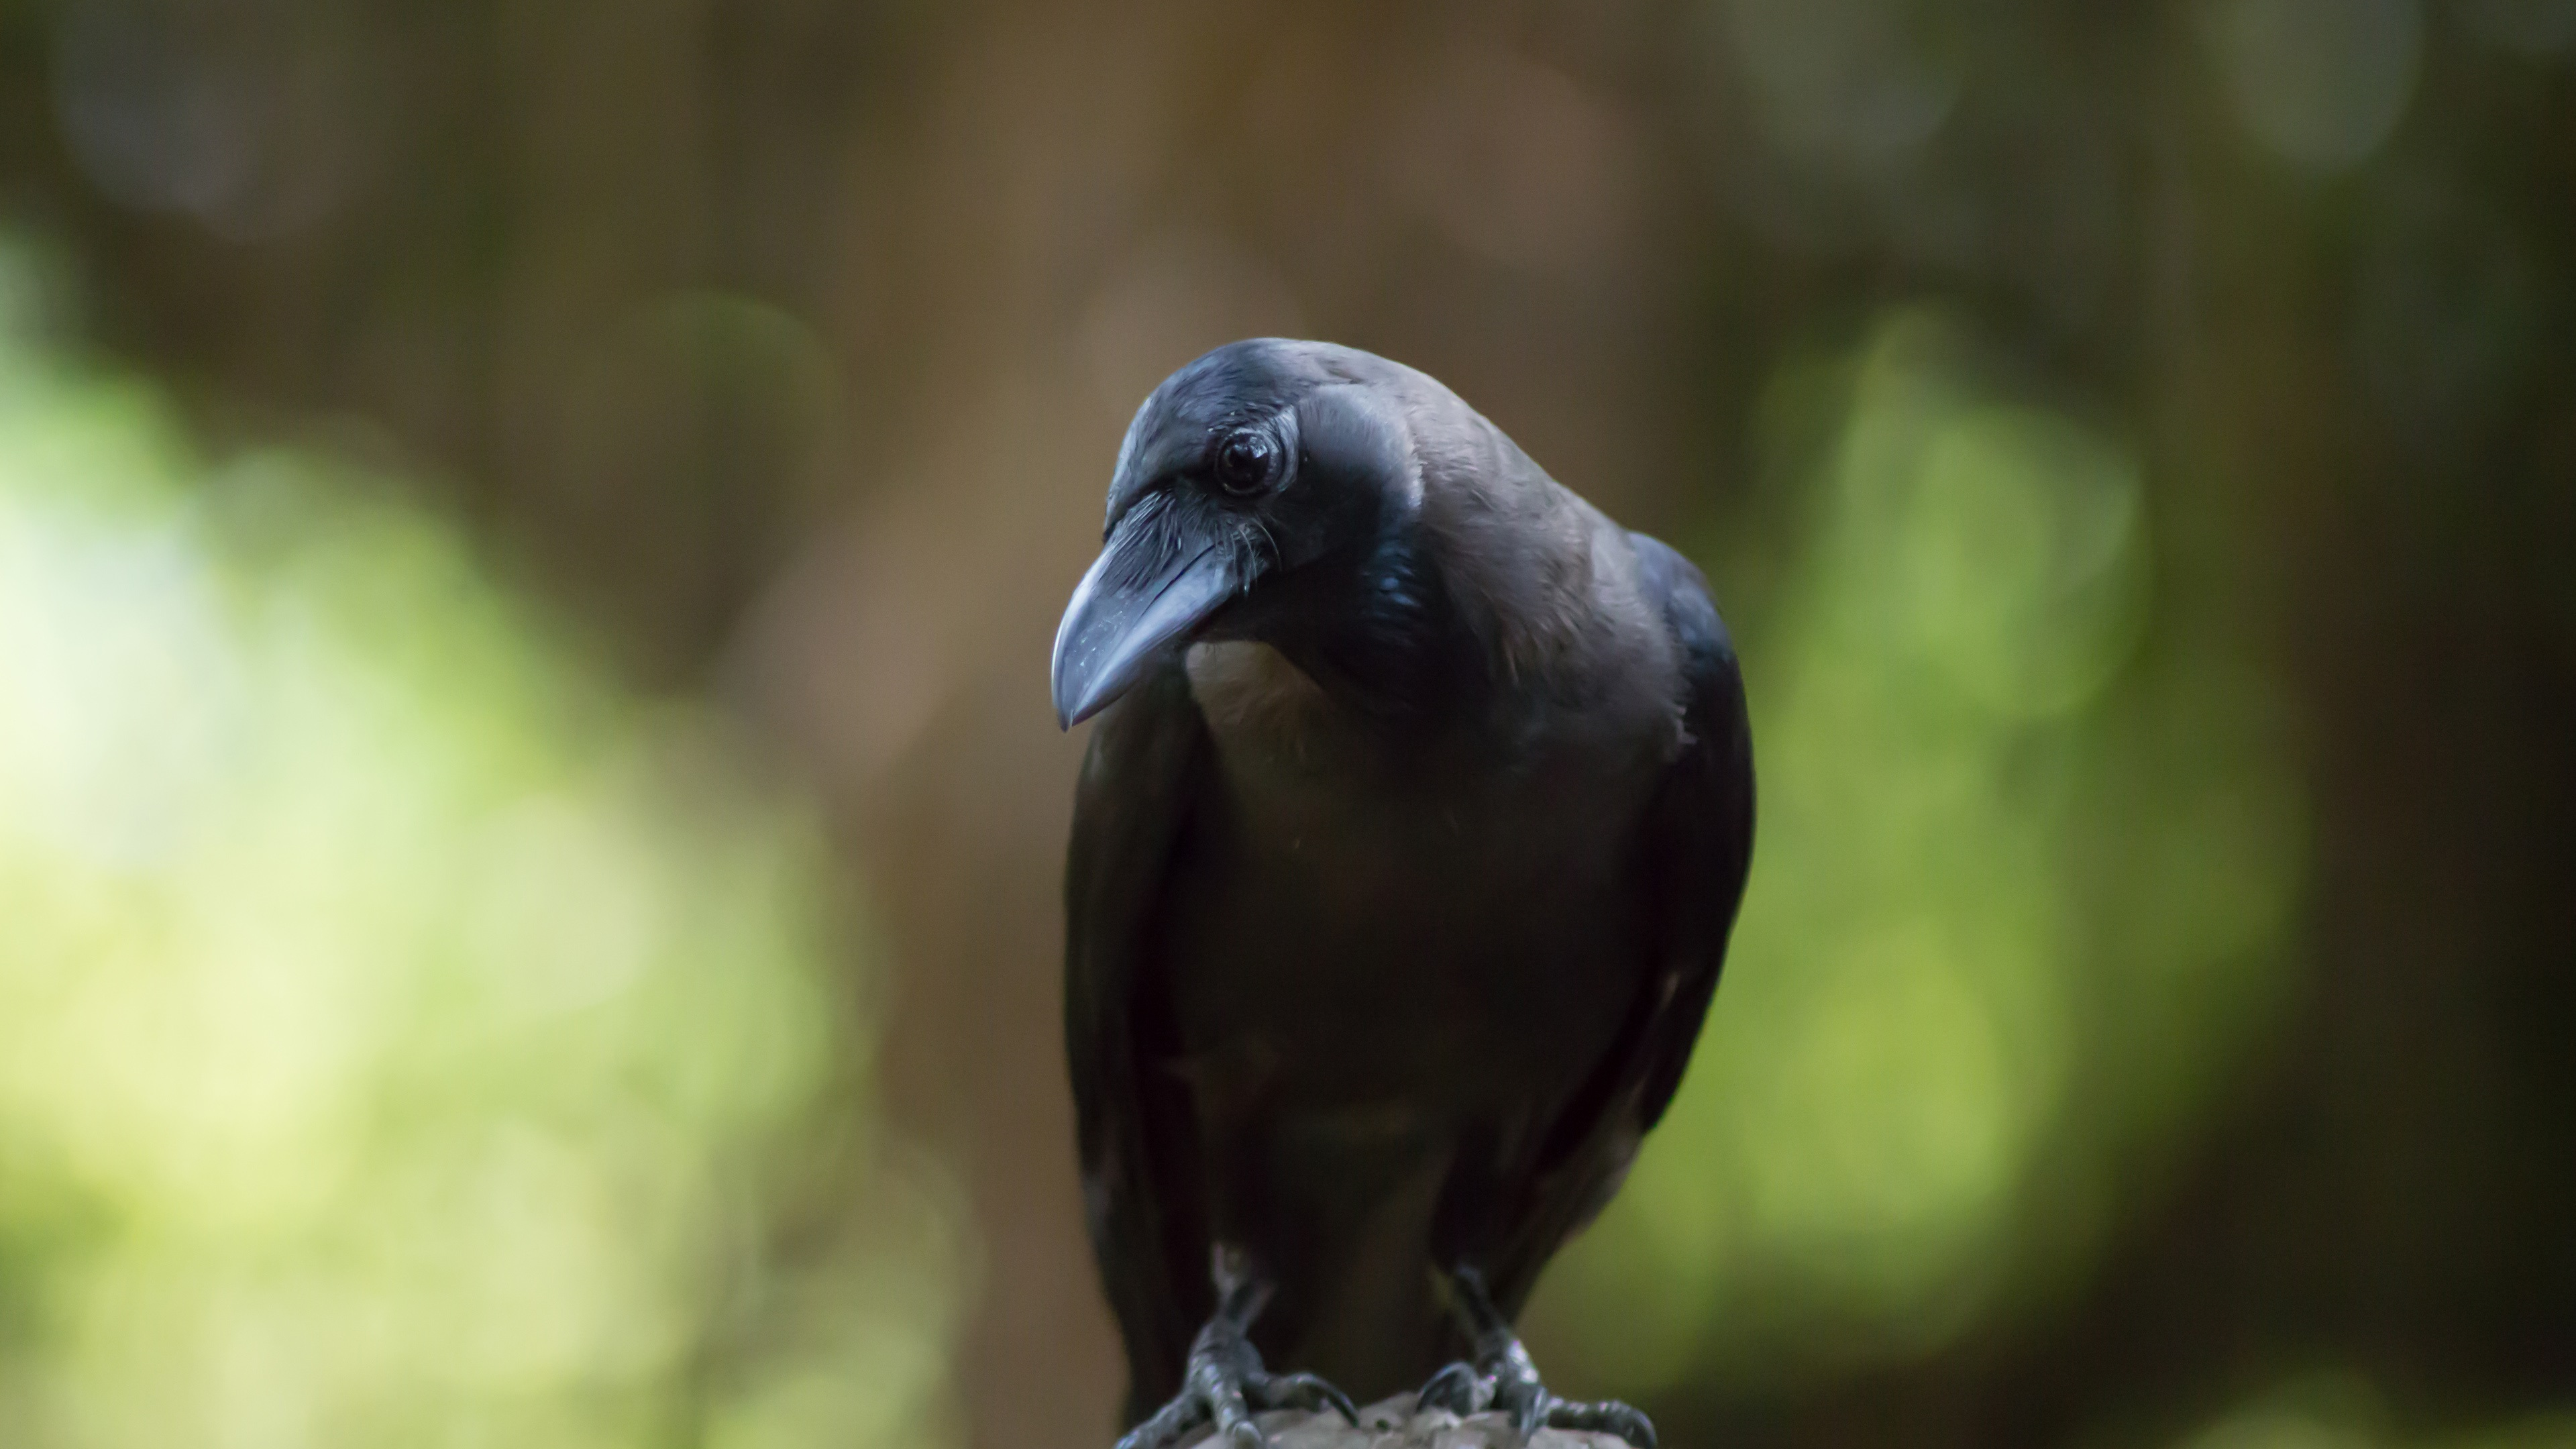 Wallpaper Crow Black Bird Green Background 3840x2160 Uhd 4k Picture Image